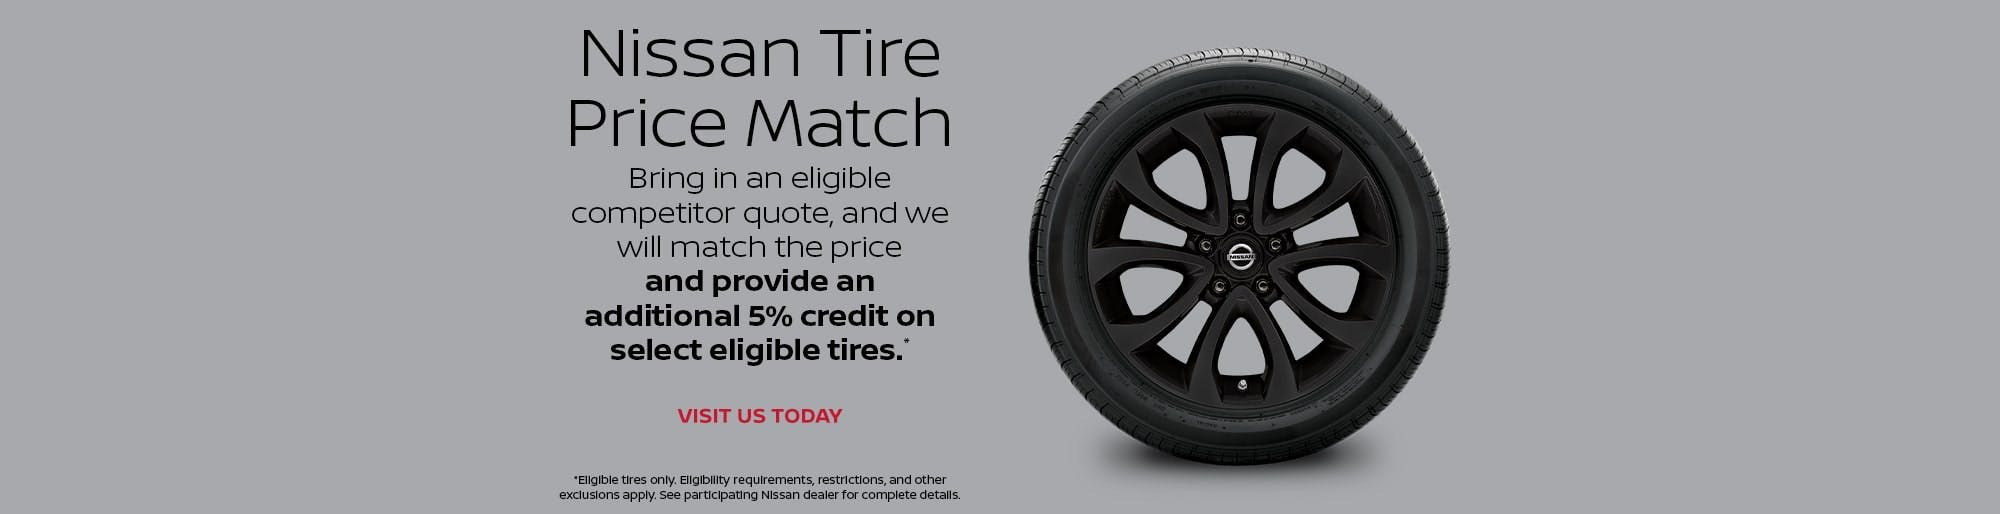 Nissan Tire Price Match